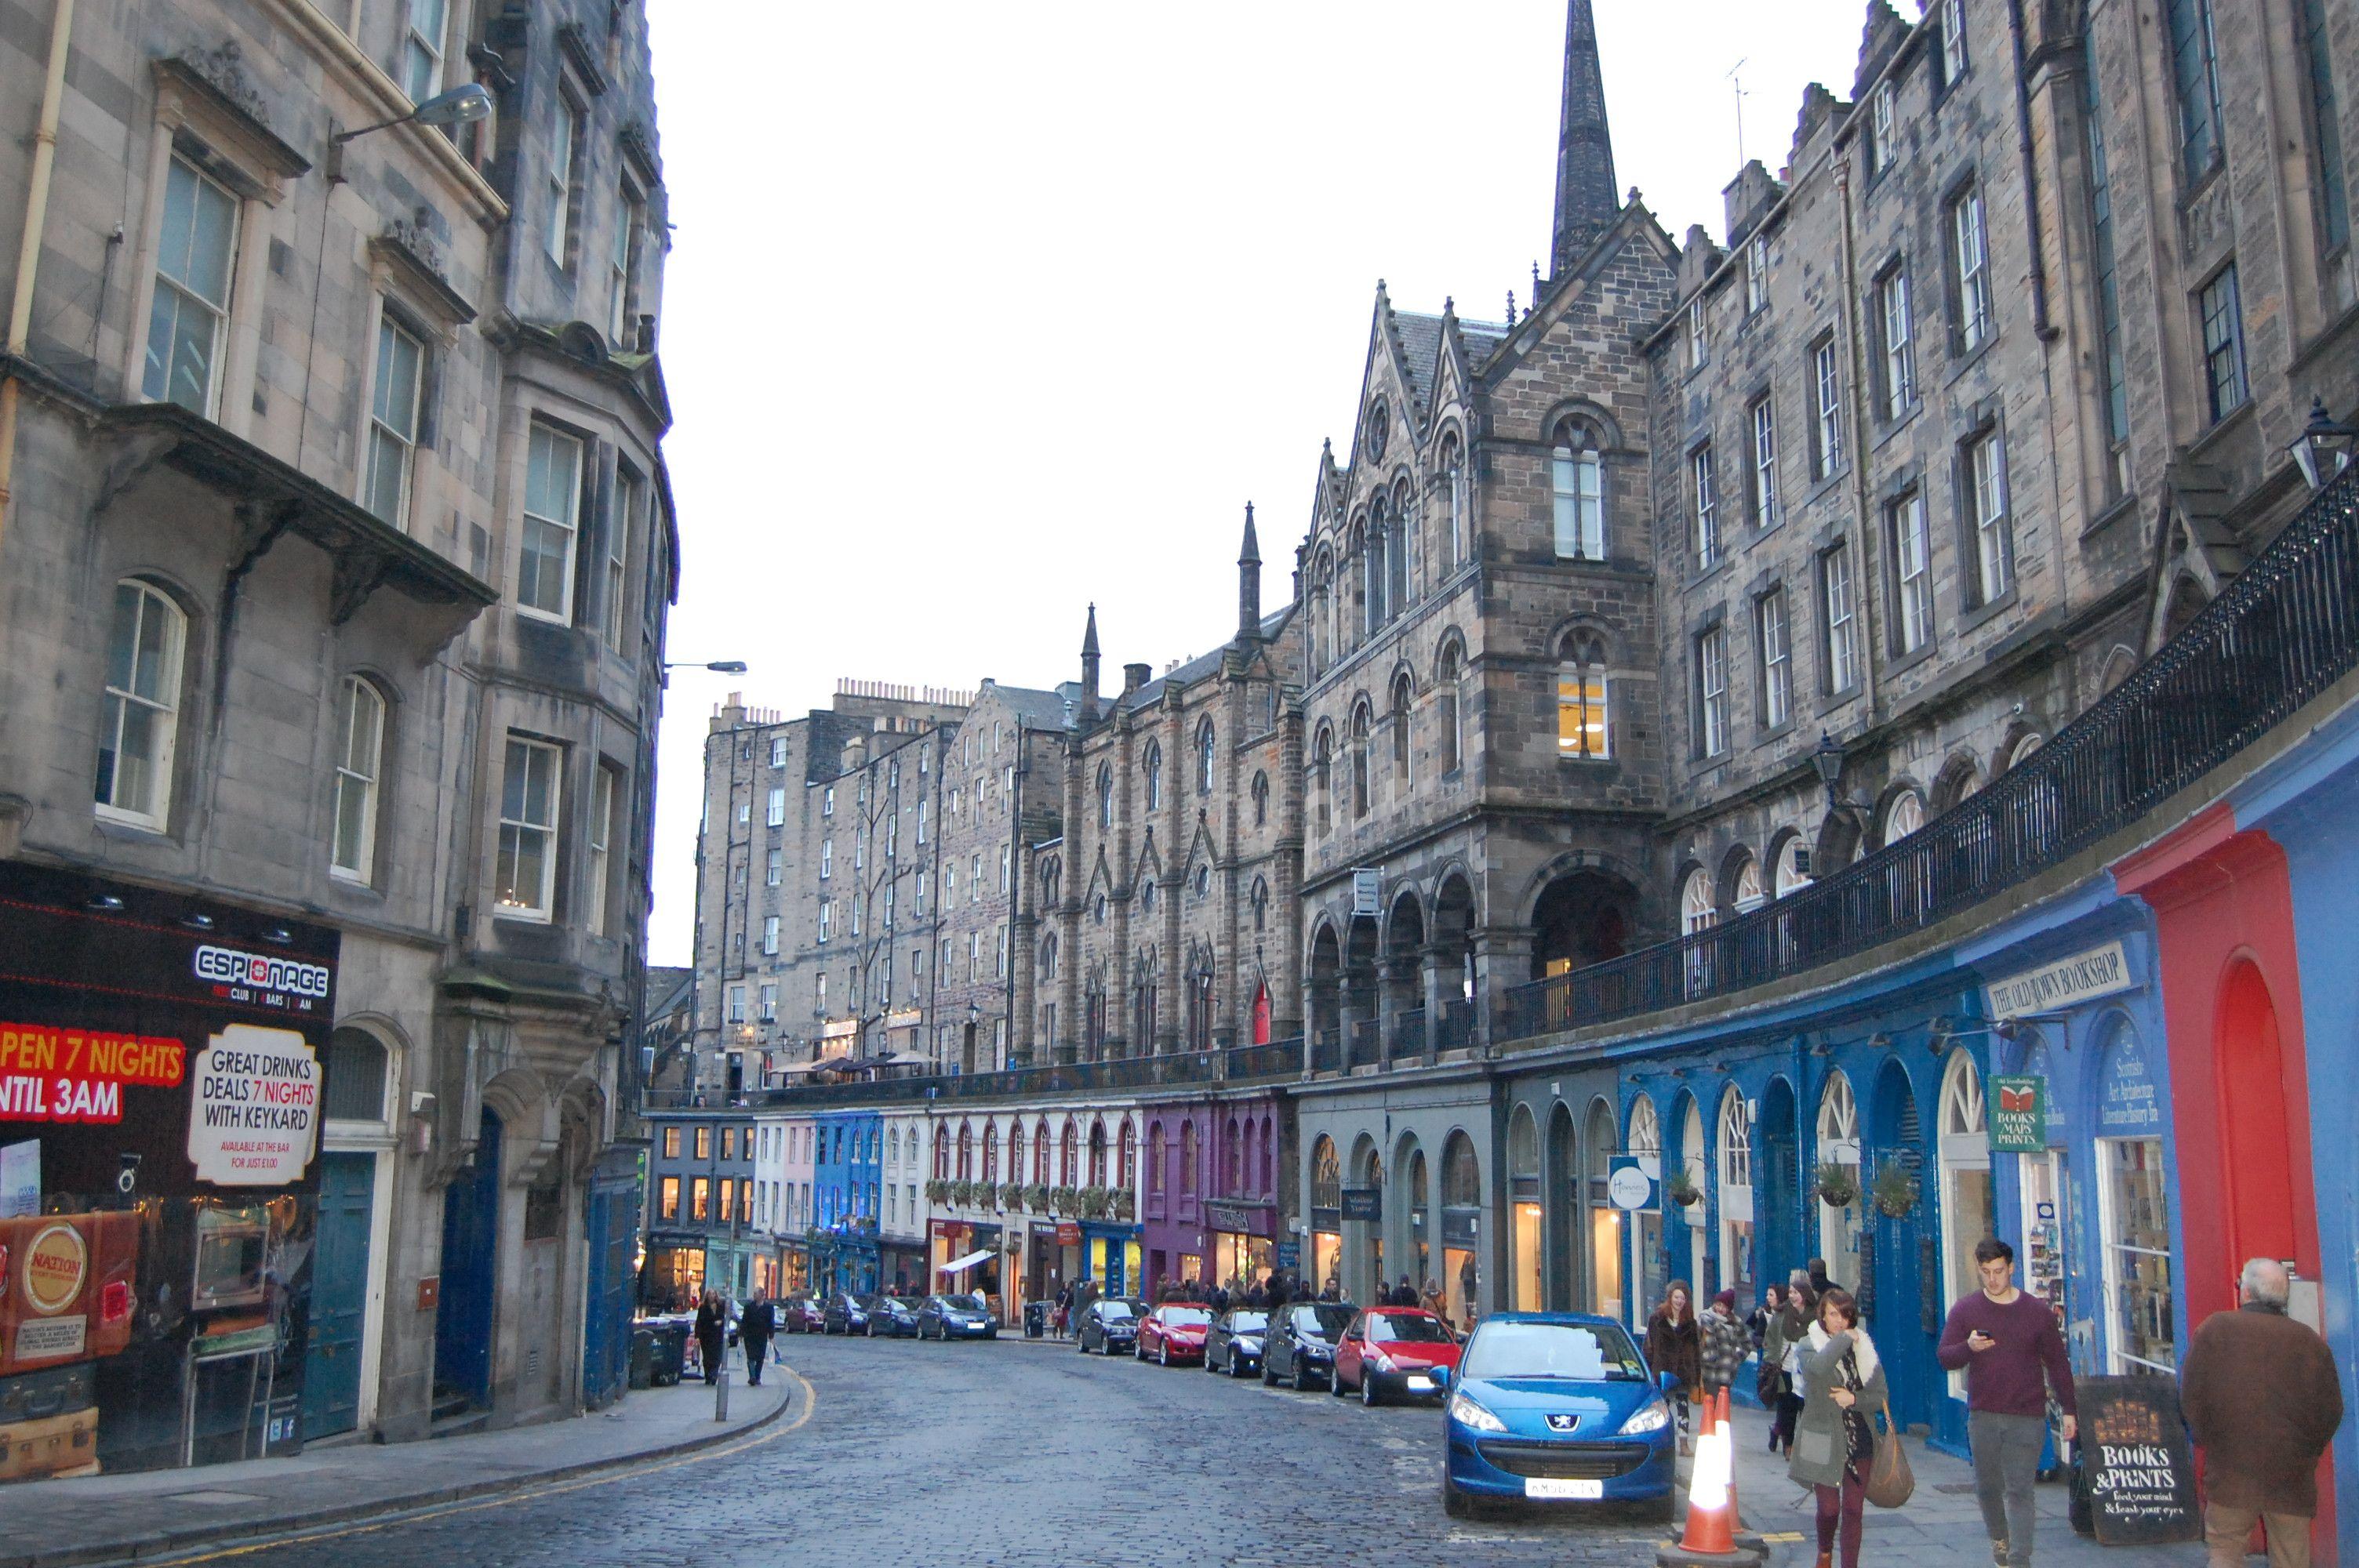 Royal Mile In Edinburgh Scotland Royale Mile Pinterest